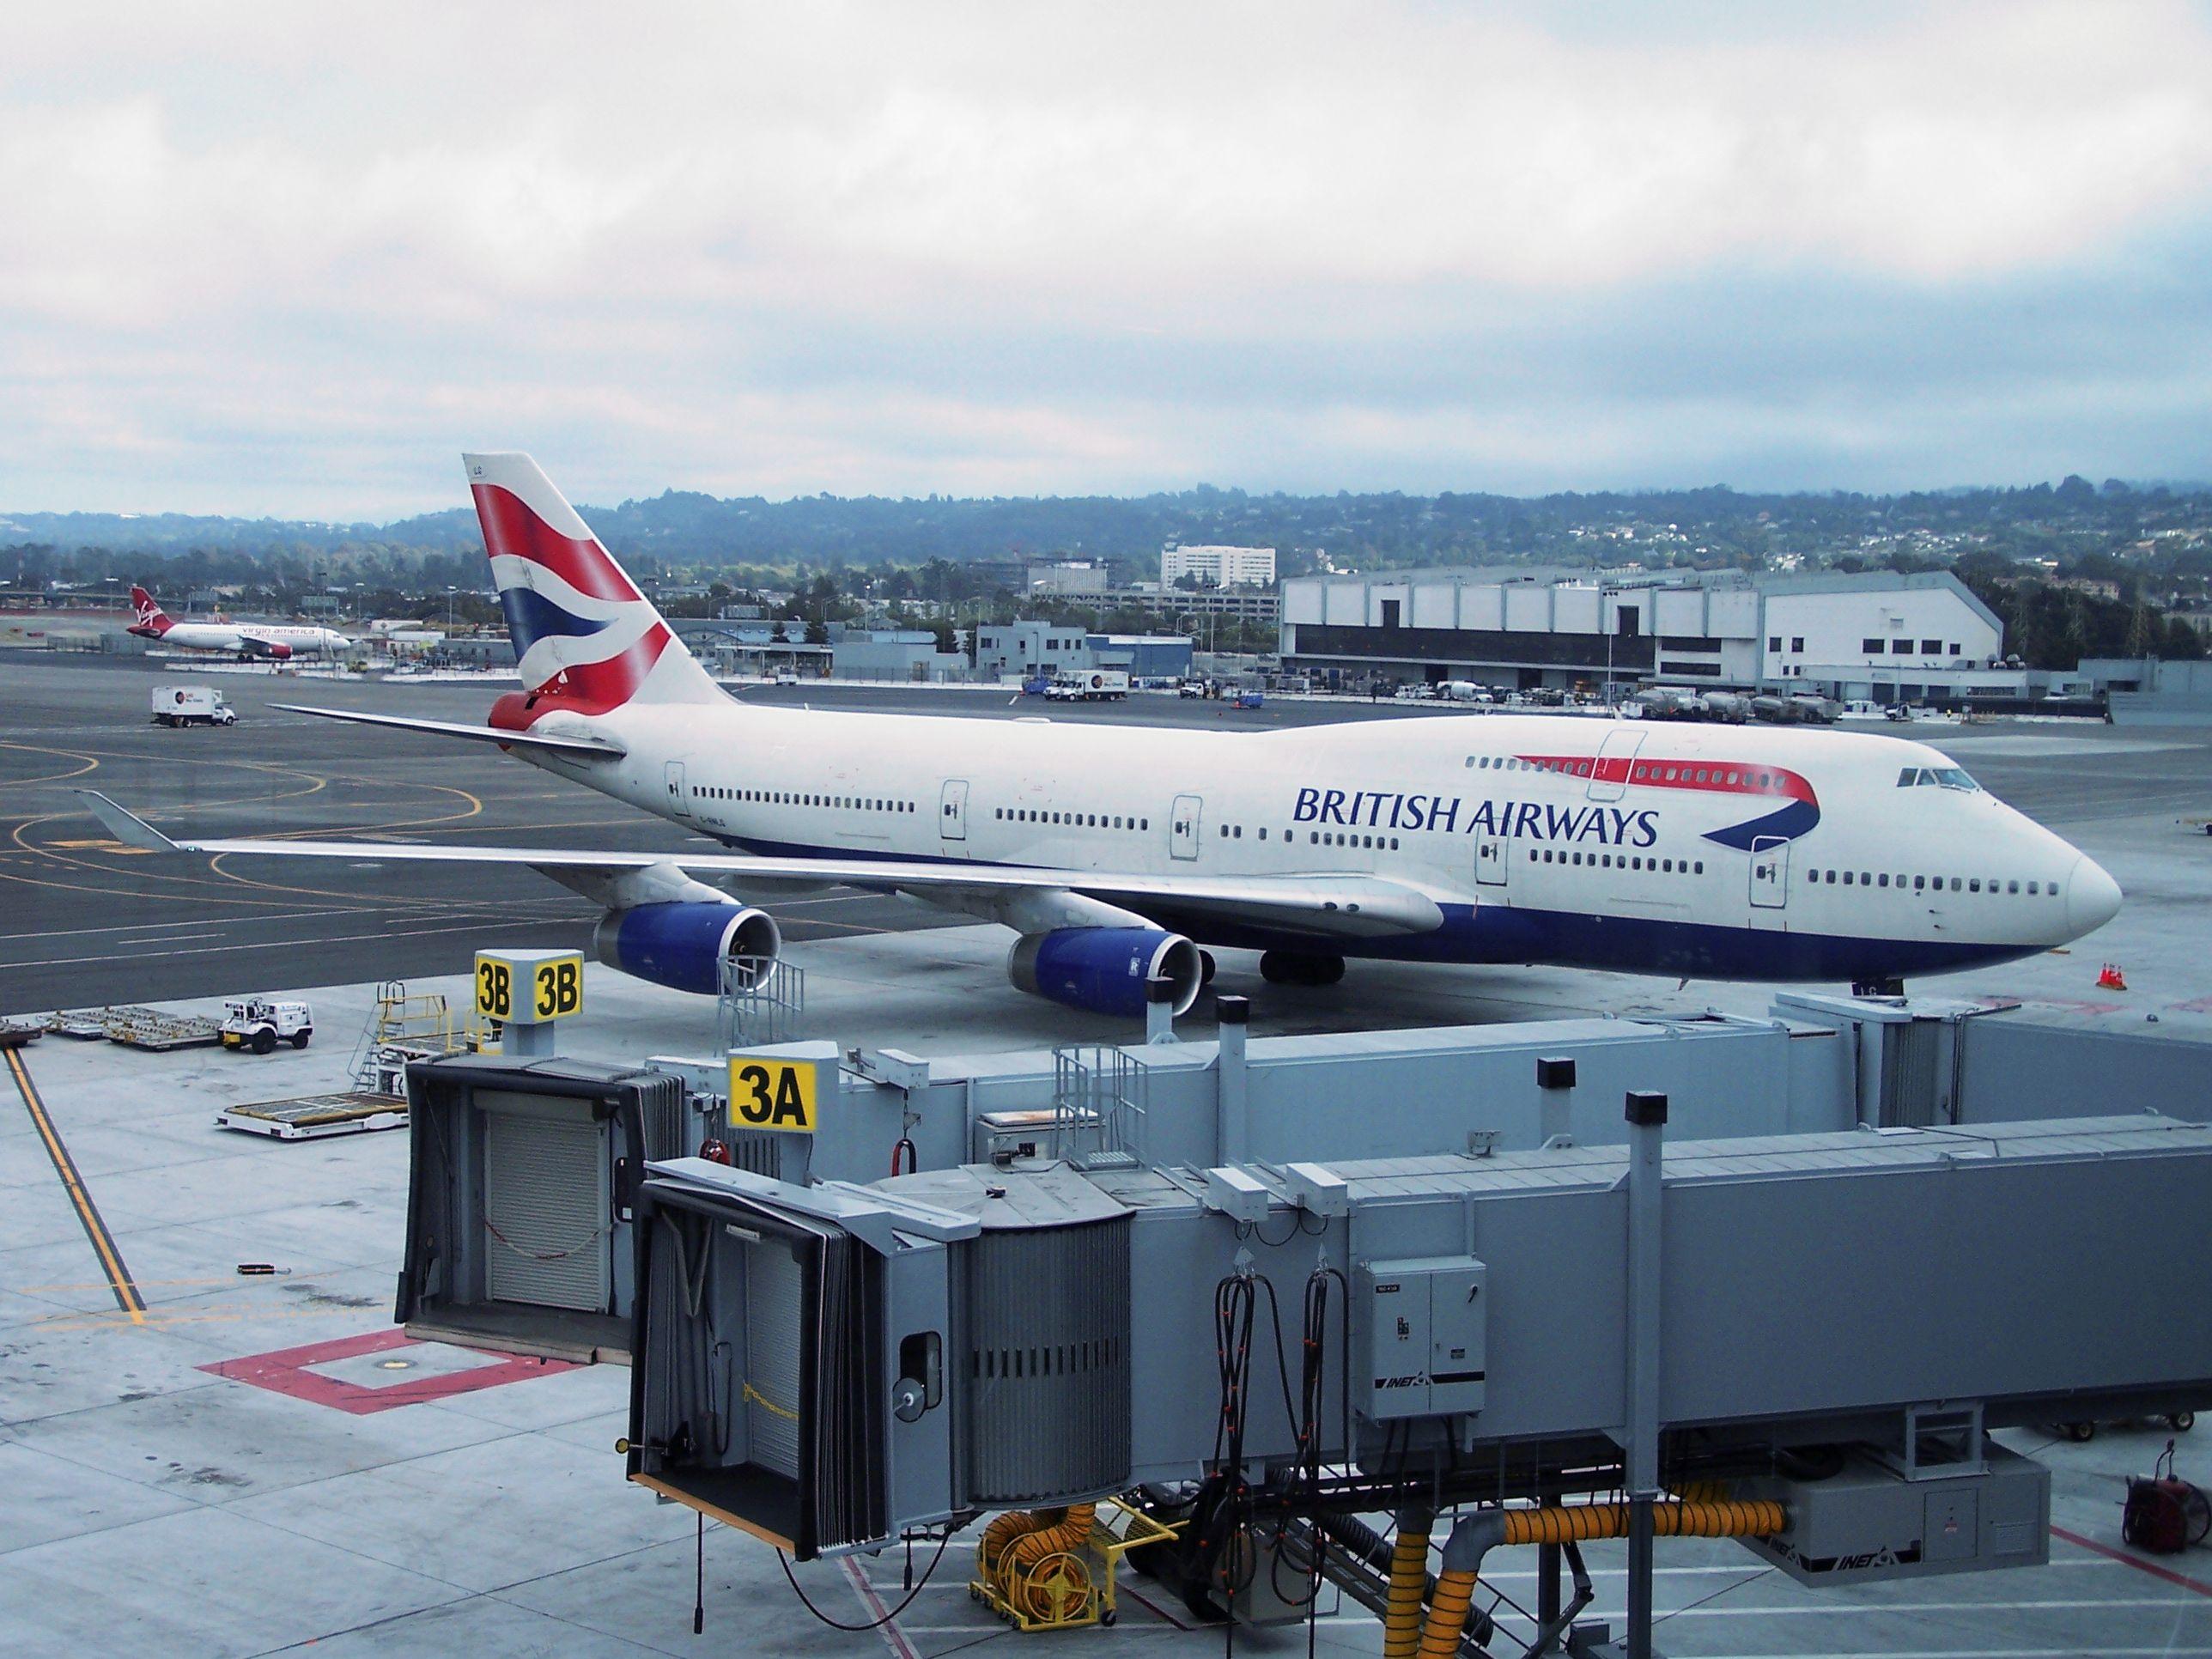 British Airways Flight 268 - Wikipedia